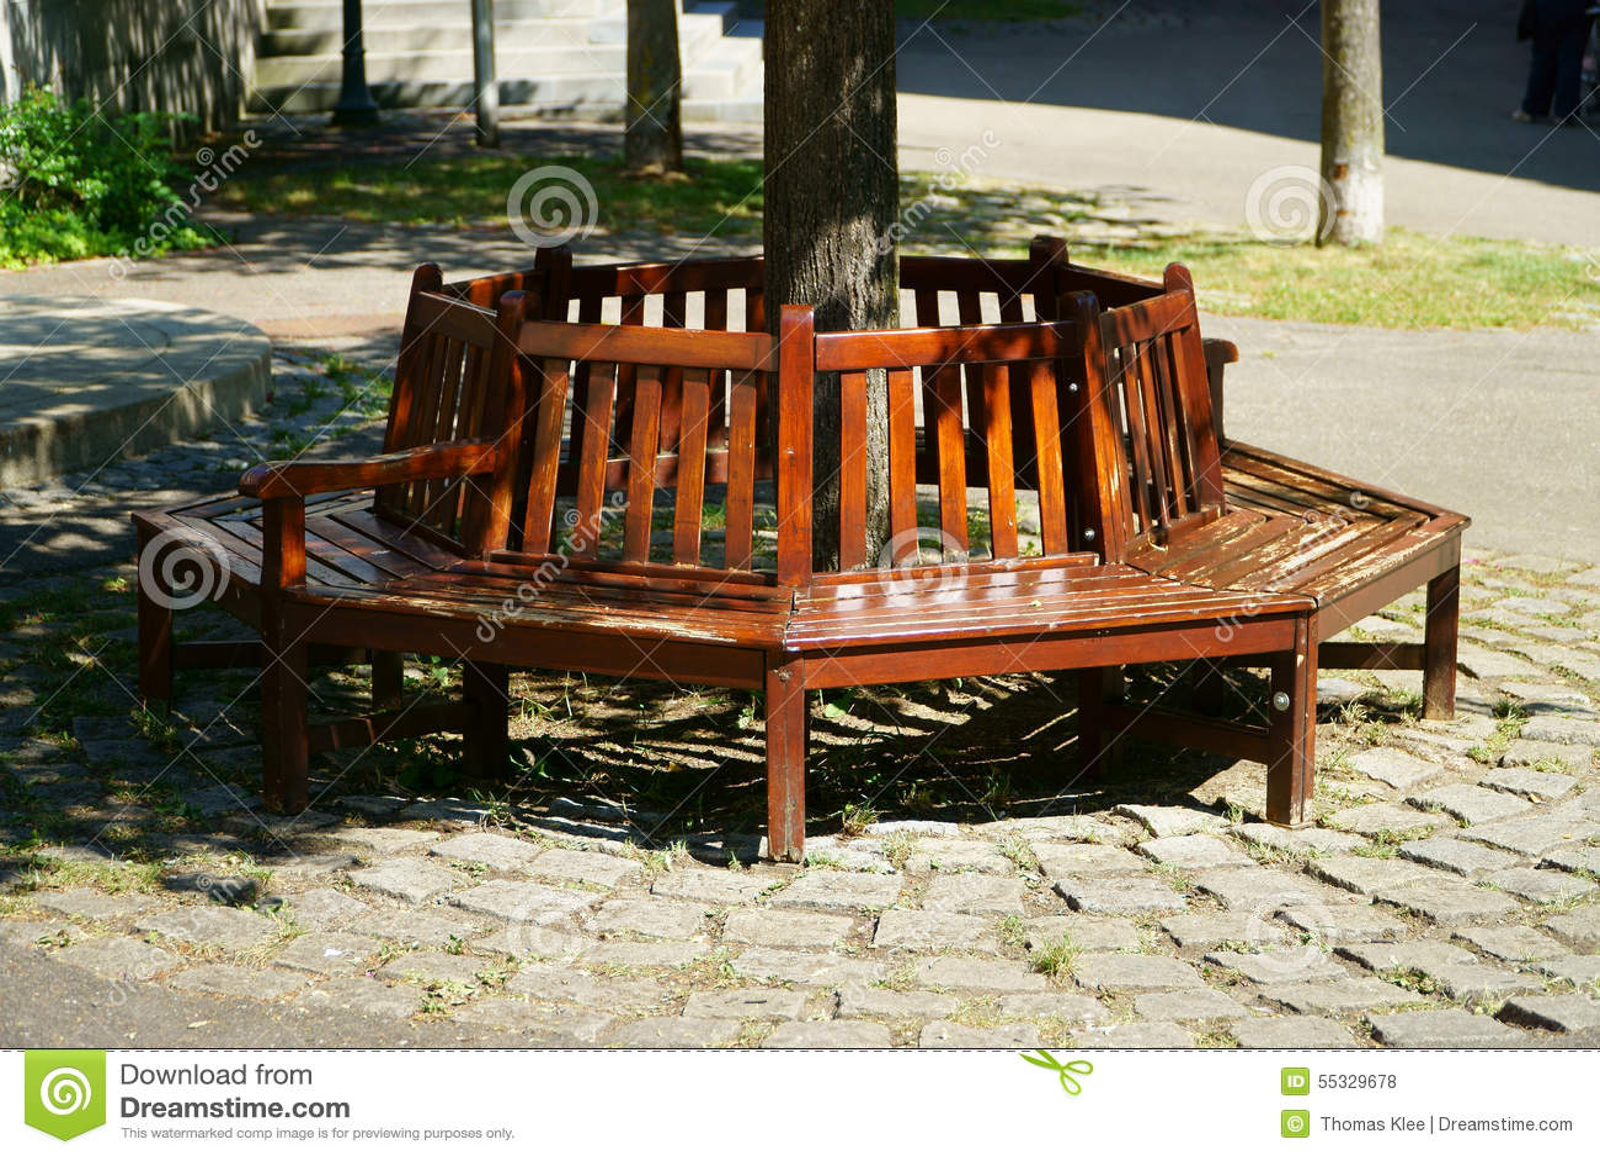 holzbank um einen baum stockfoto bild 55329678. Black Bedroom Furniture Sets. Home Design Ideas